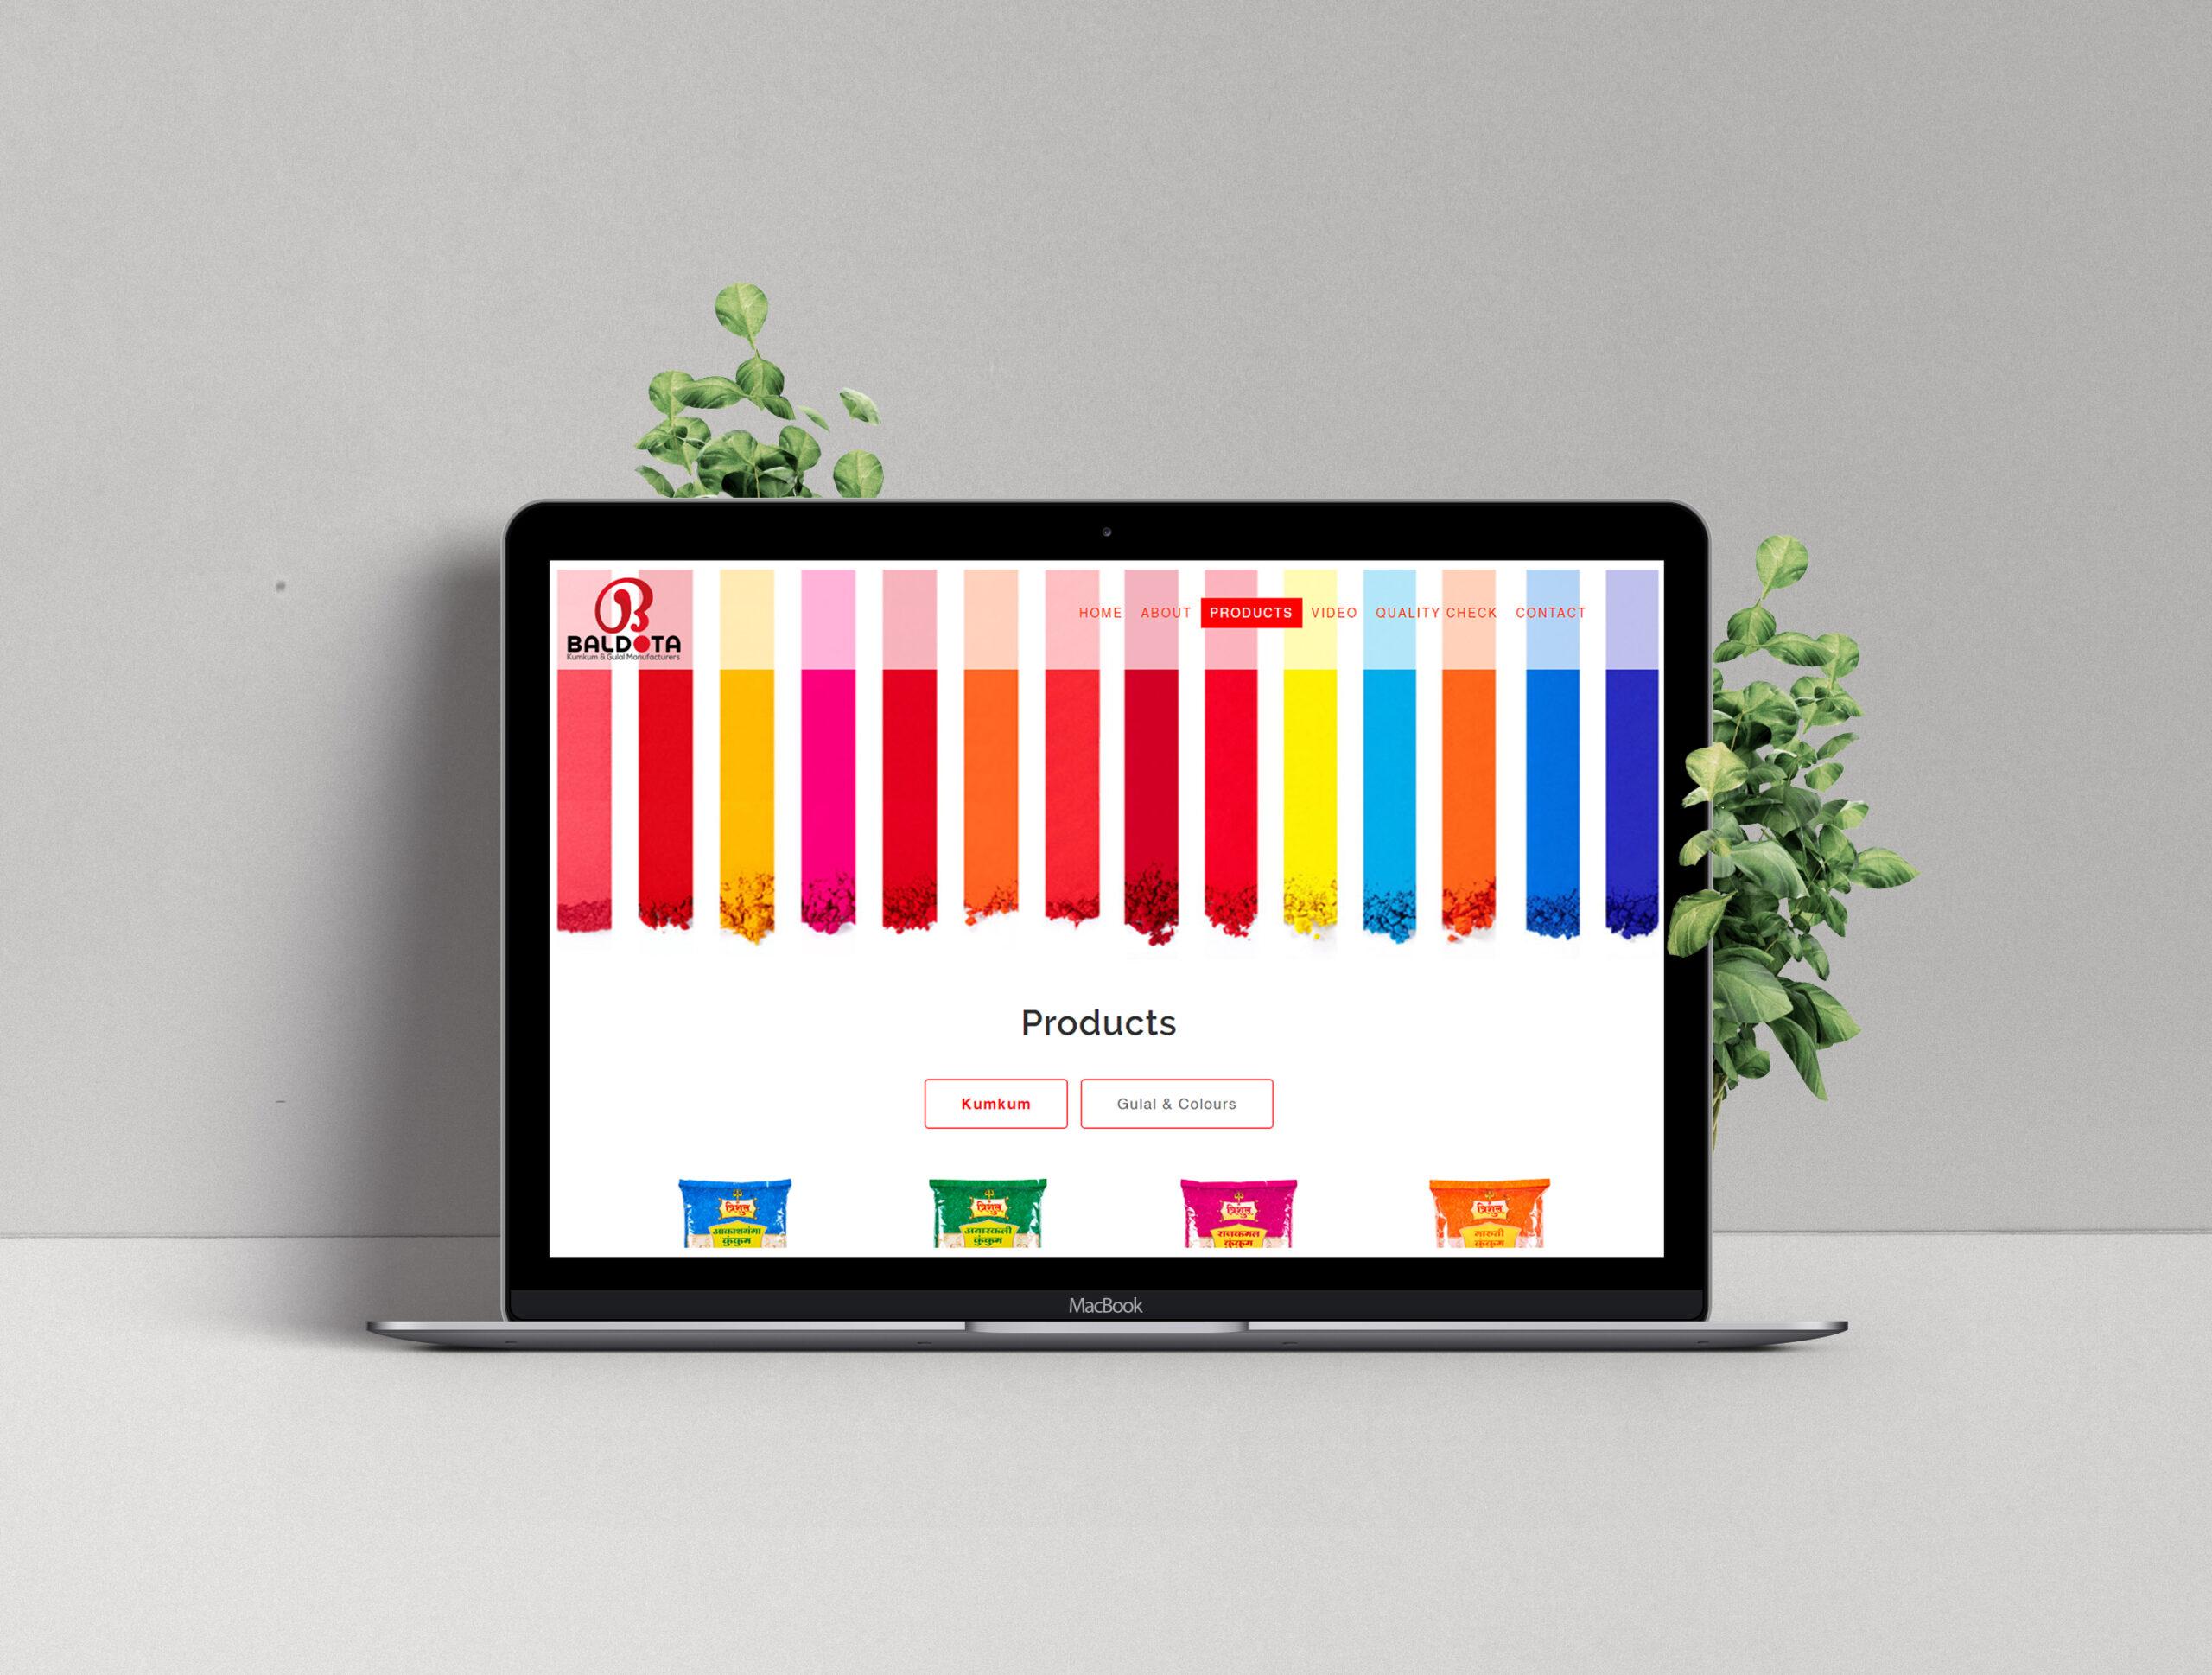 Baldota Website Design